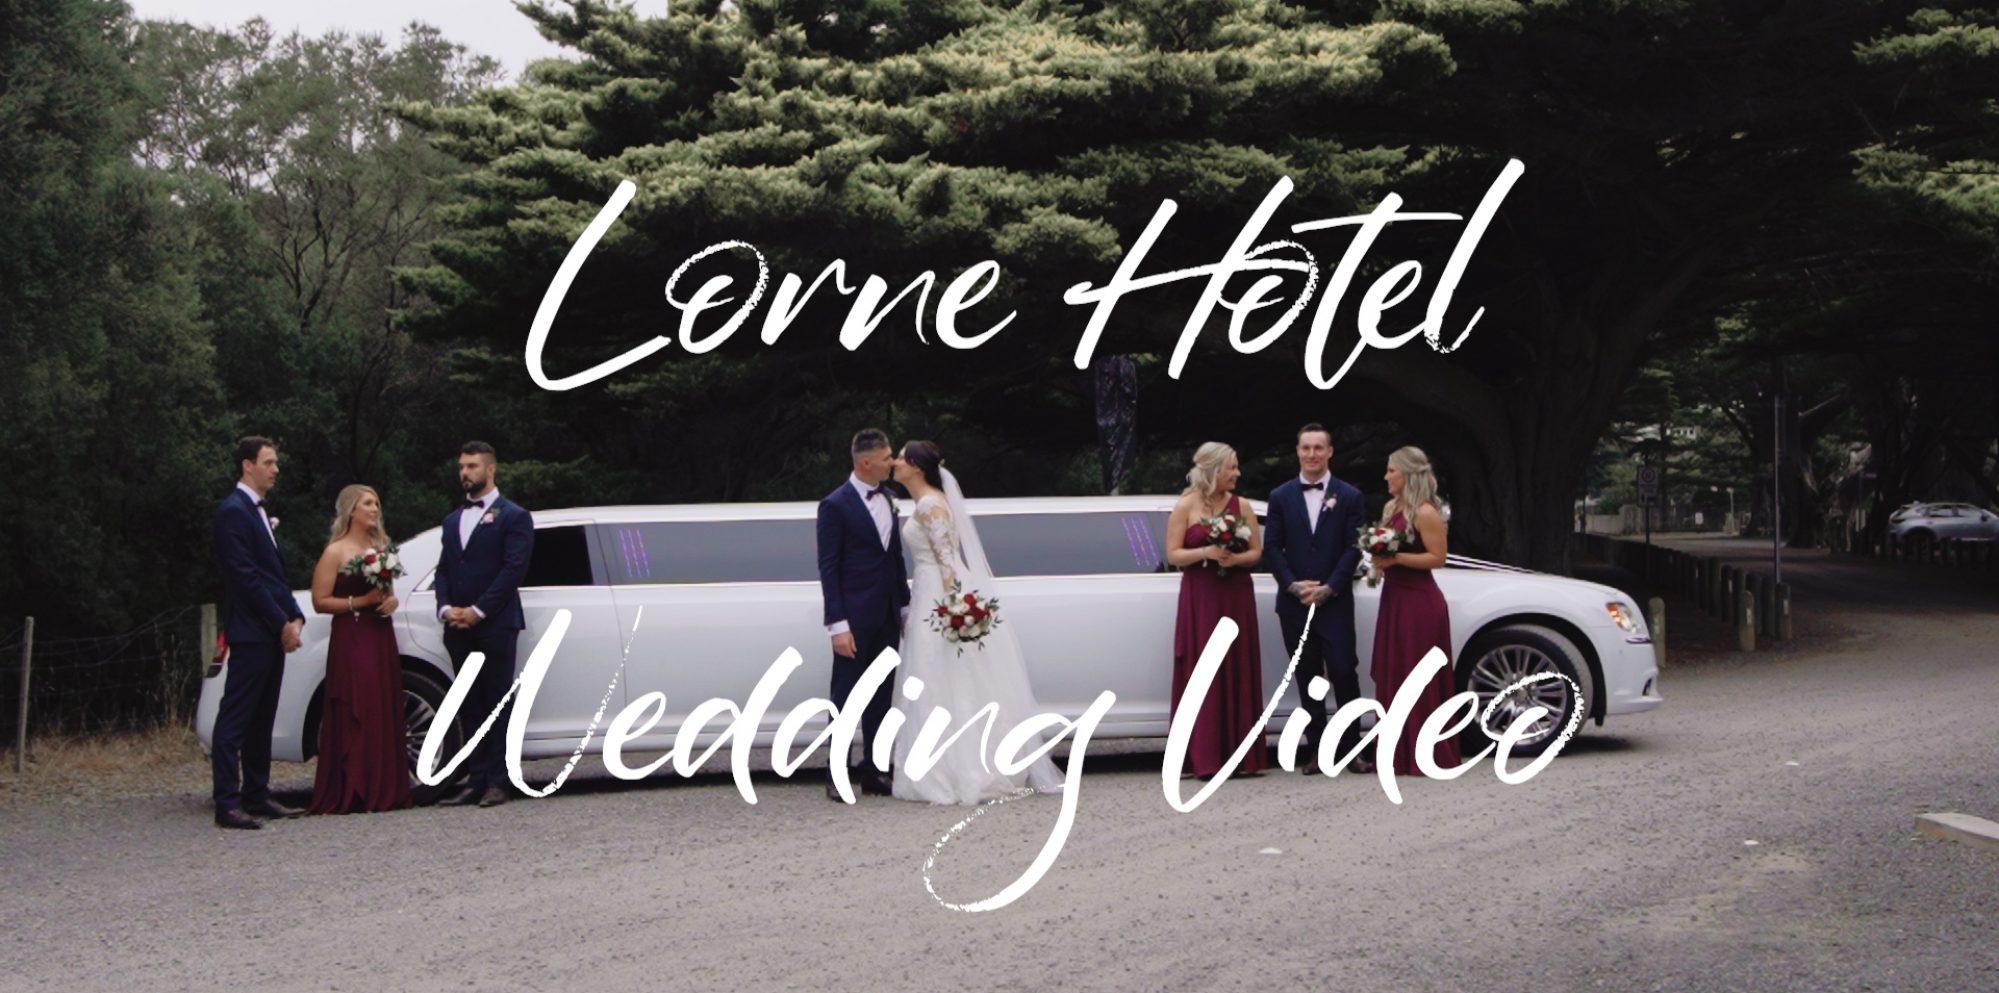 Rebecca & klay wedding videography @ lorne hotel